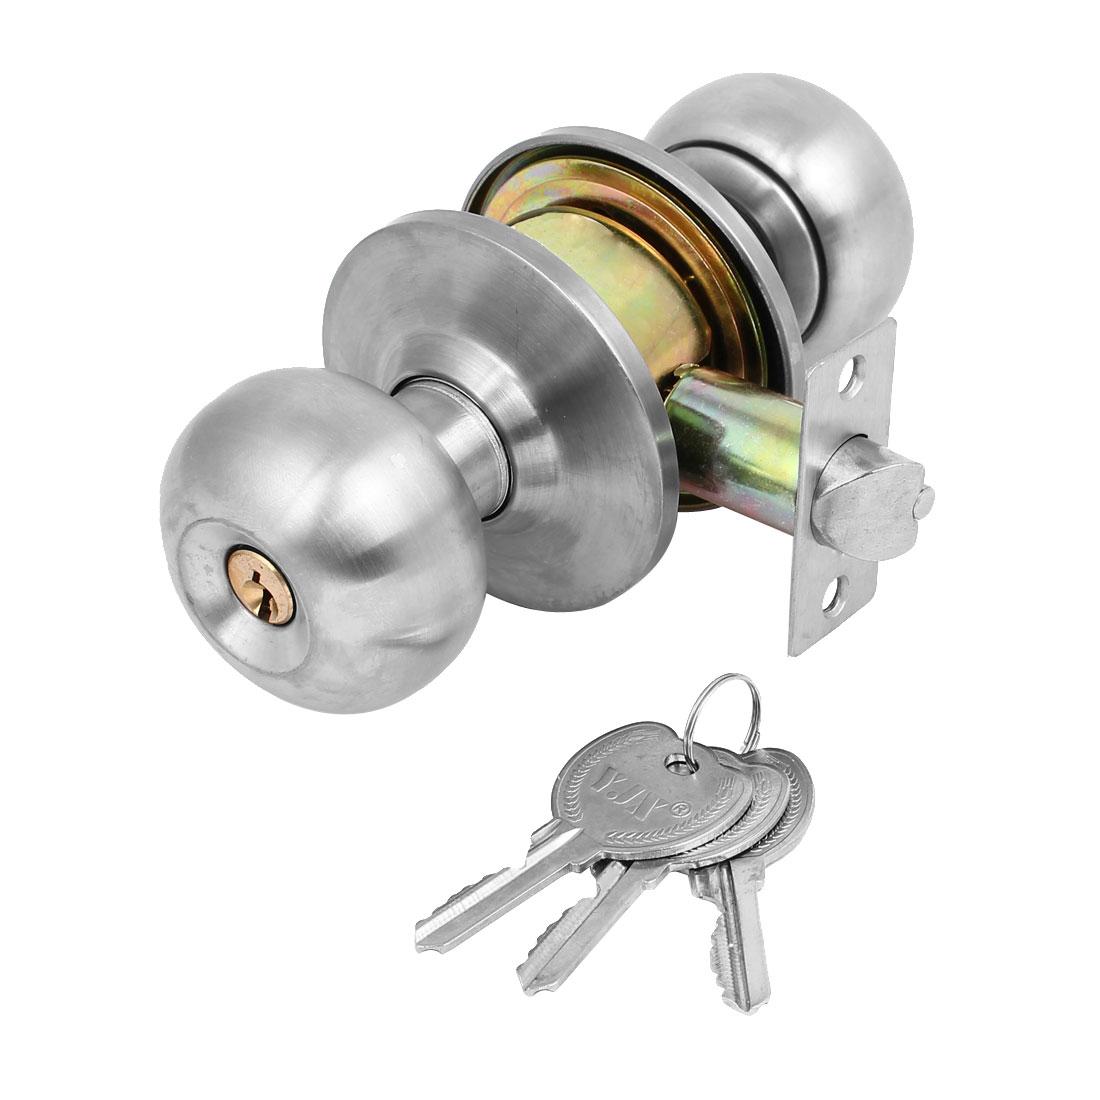 Ball Keyed Door Knob Set Three Keyed Alike Stainless Brushed For Door 35-50mm